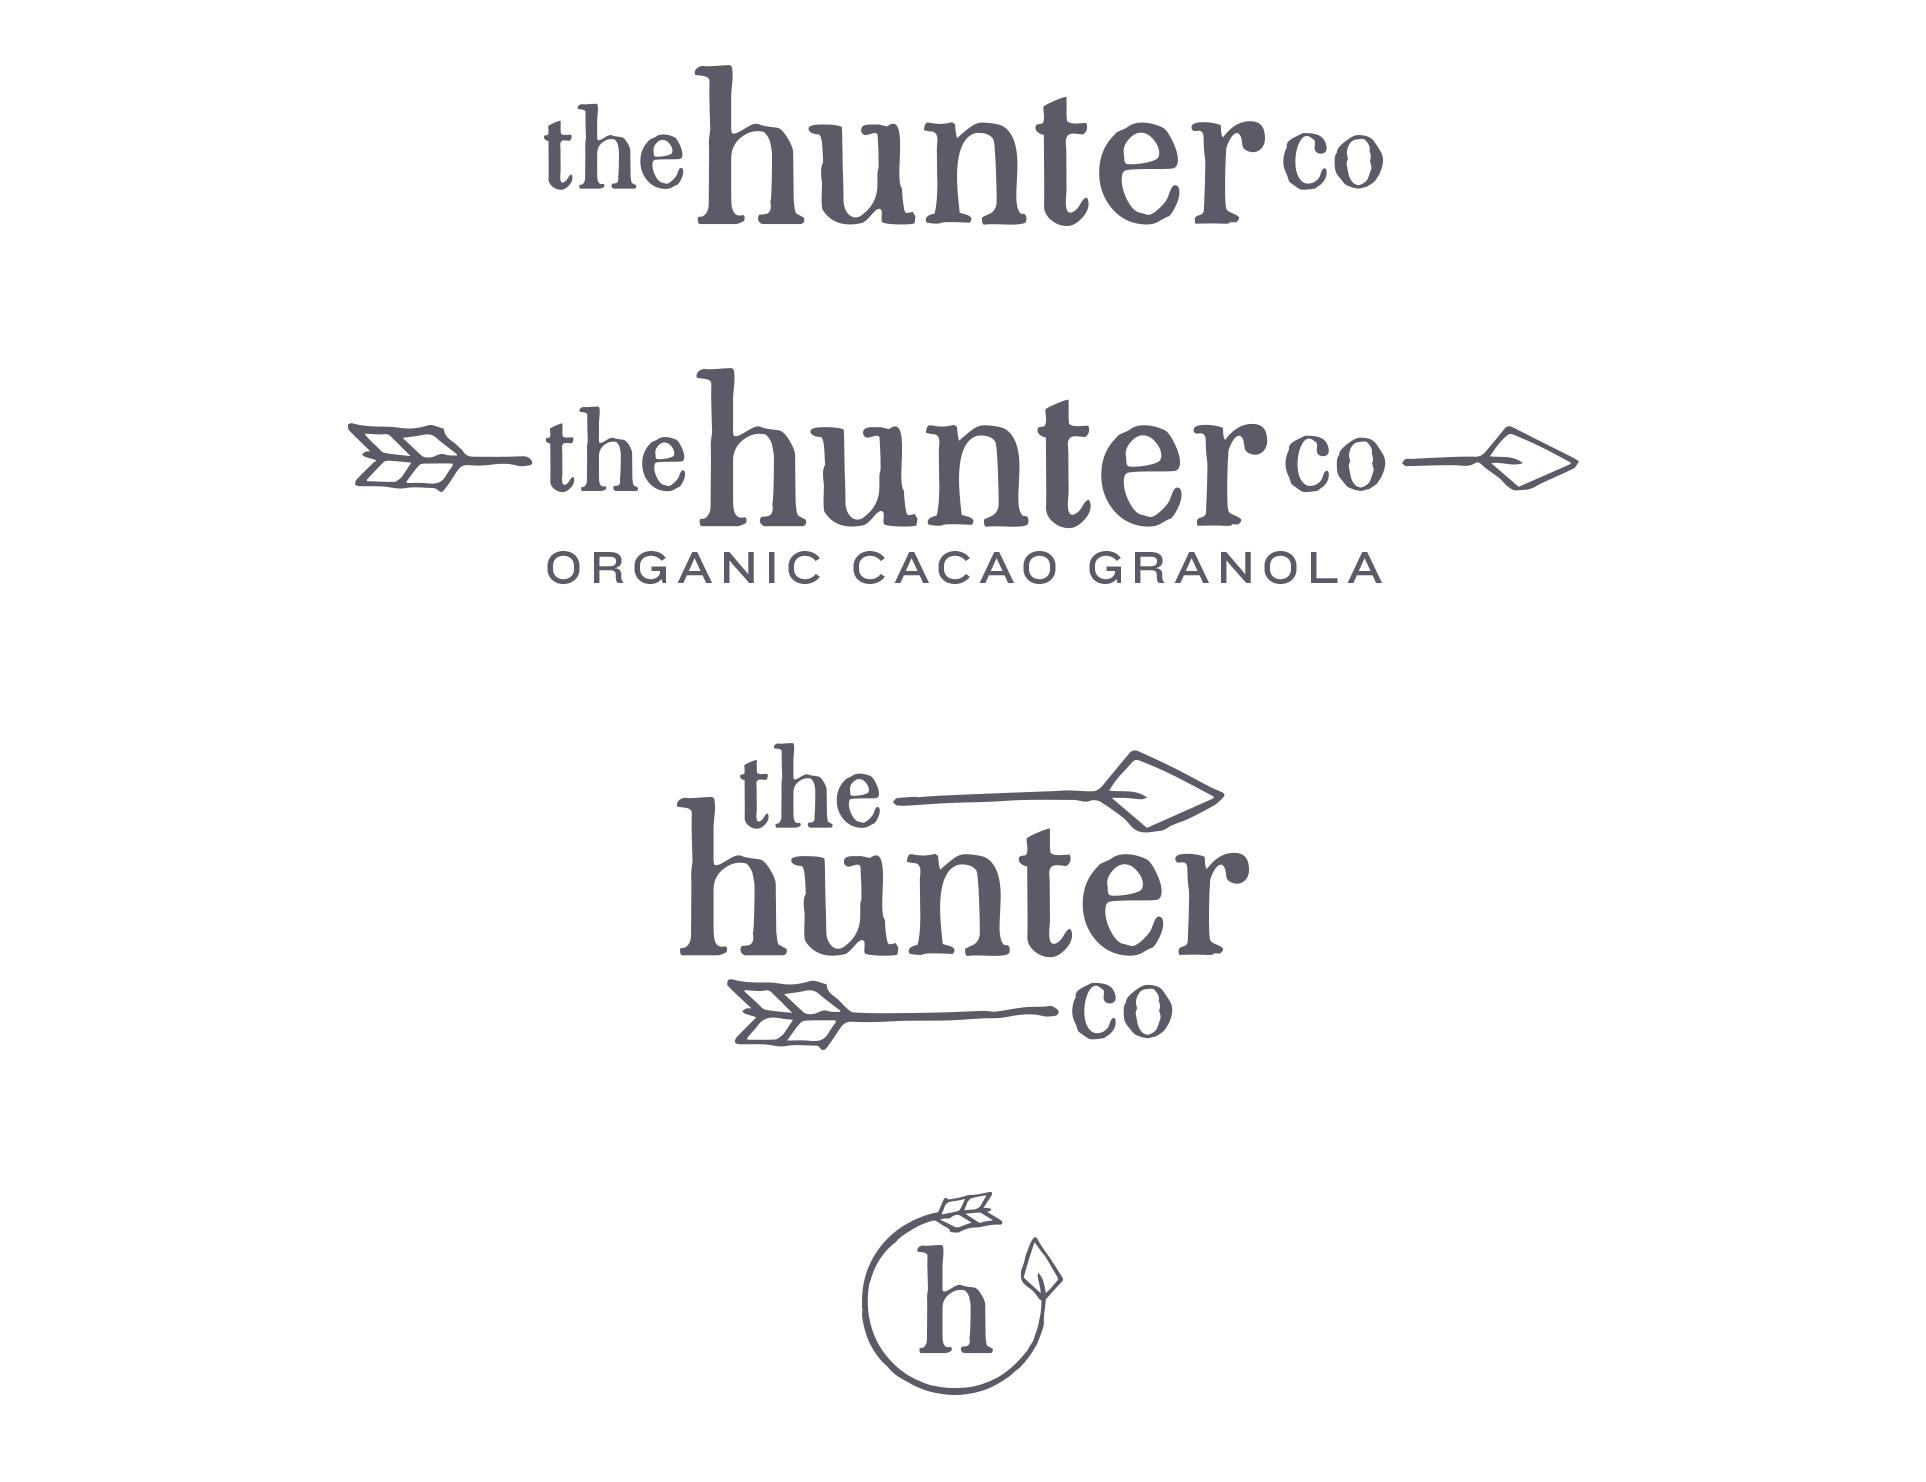 The Hunter Co logo